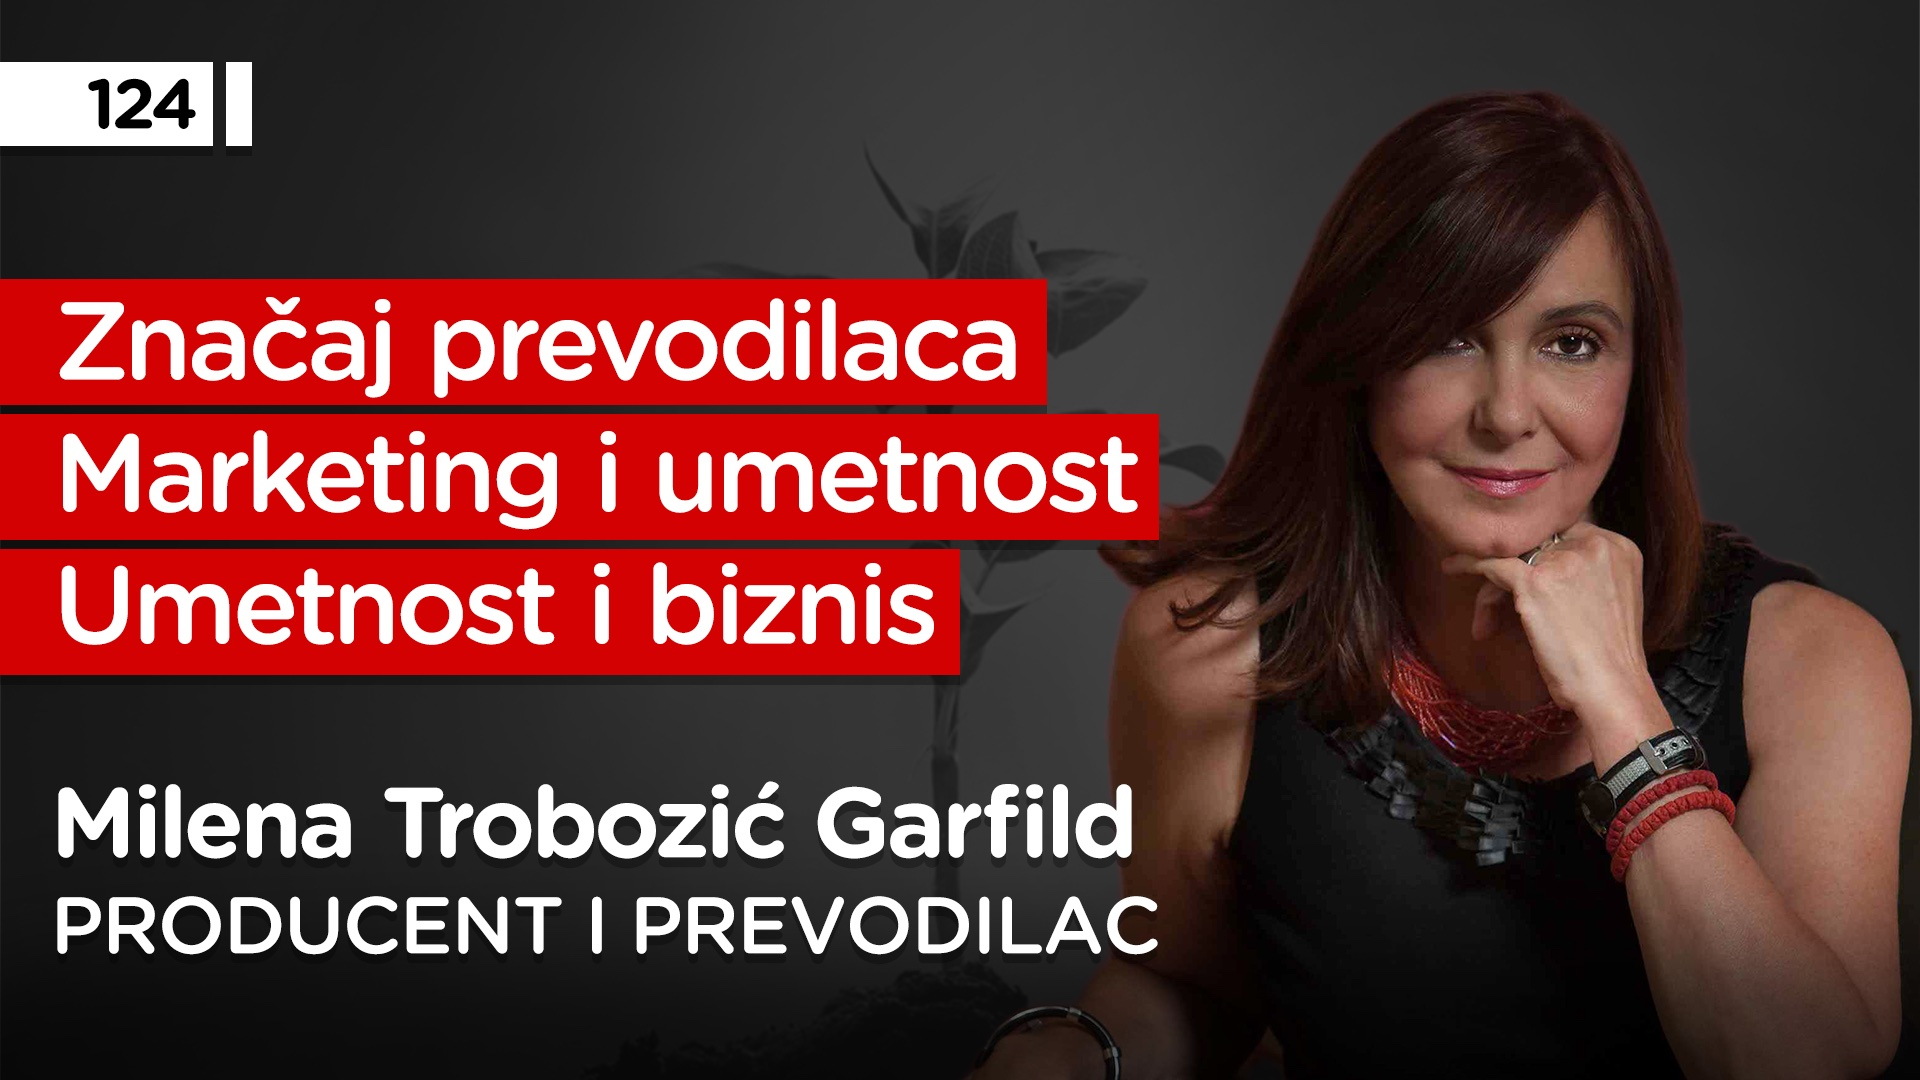 EP124: Milena Trobozić Garfild